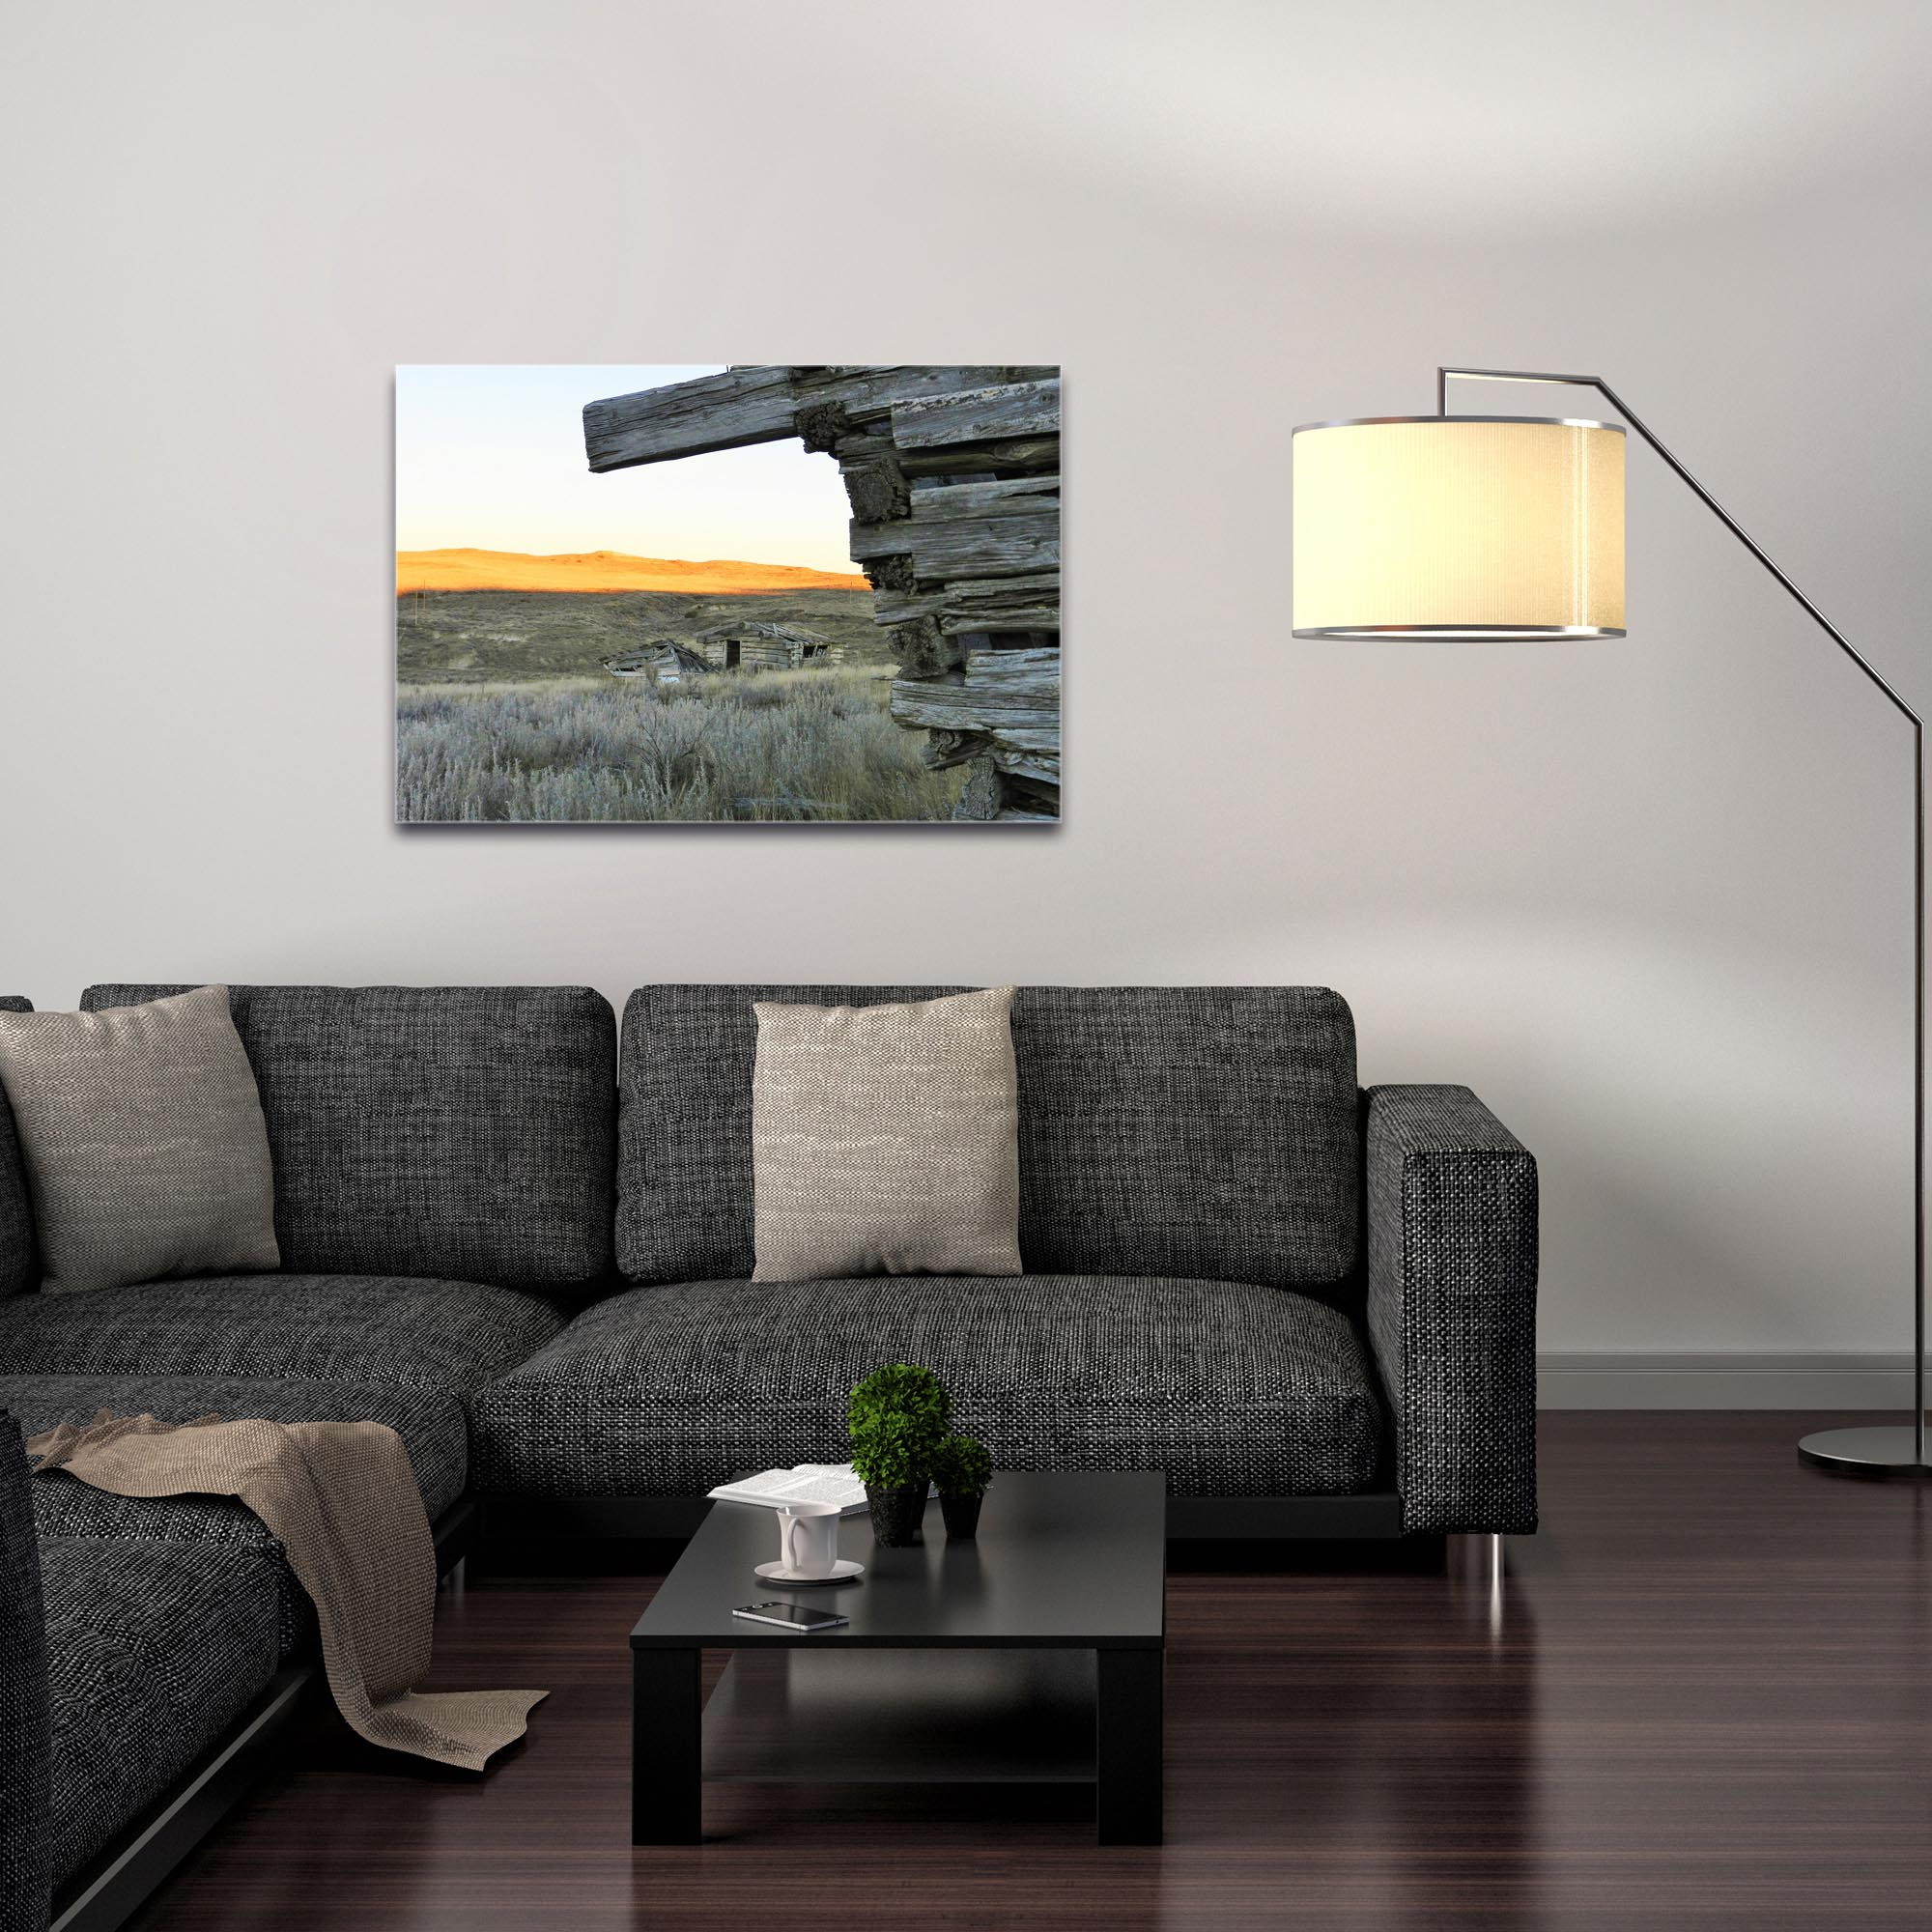 Western Wall Art 'The Corner' - American West Decor on Metal or Plexiglass - Image 3